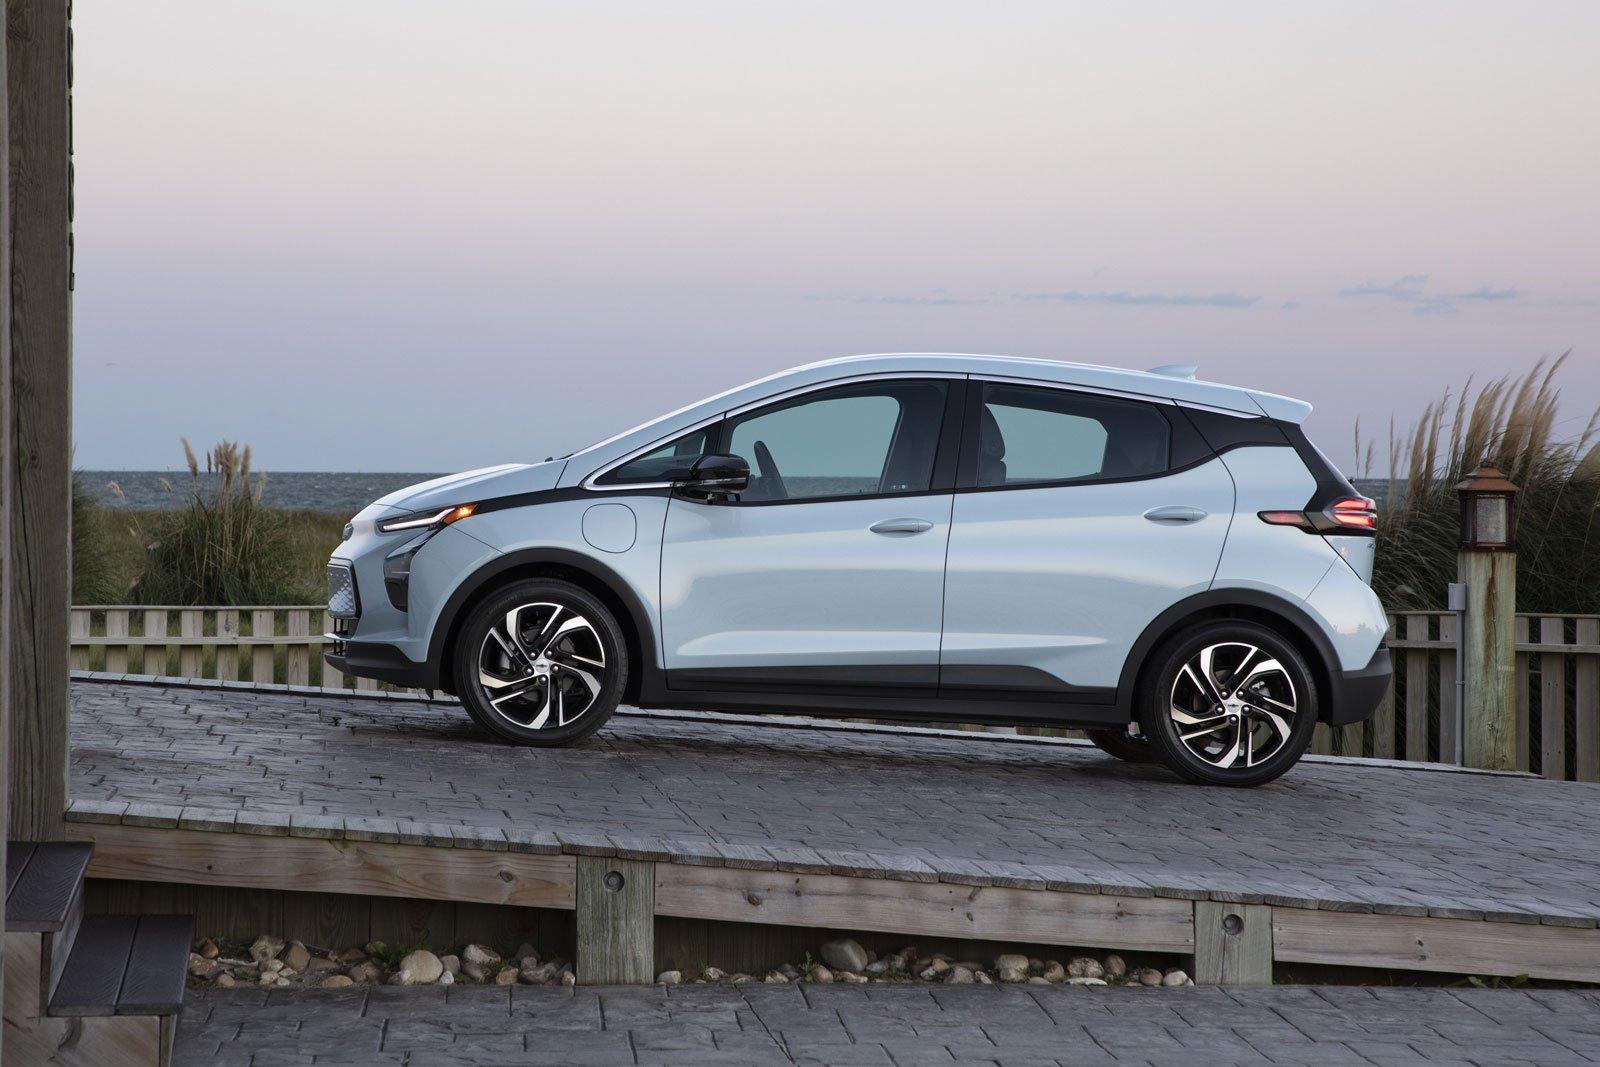 2022-Chevrolet-Bolt-EV-15